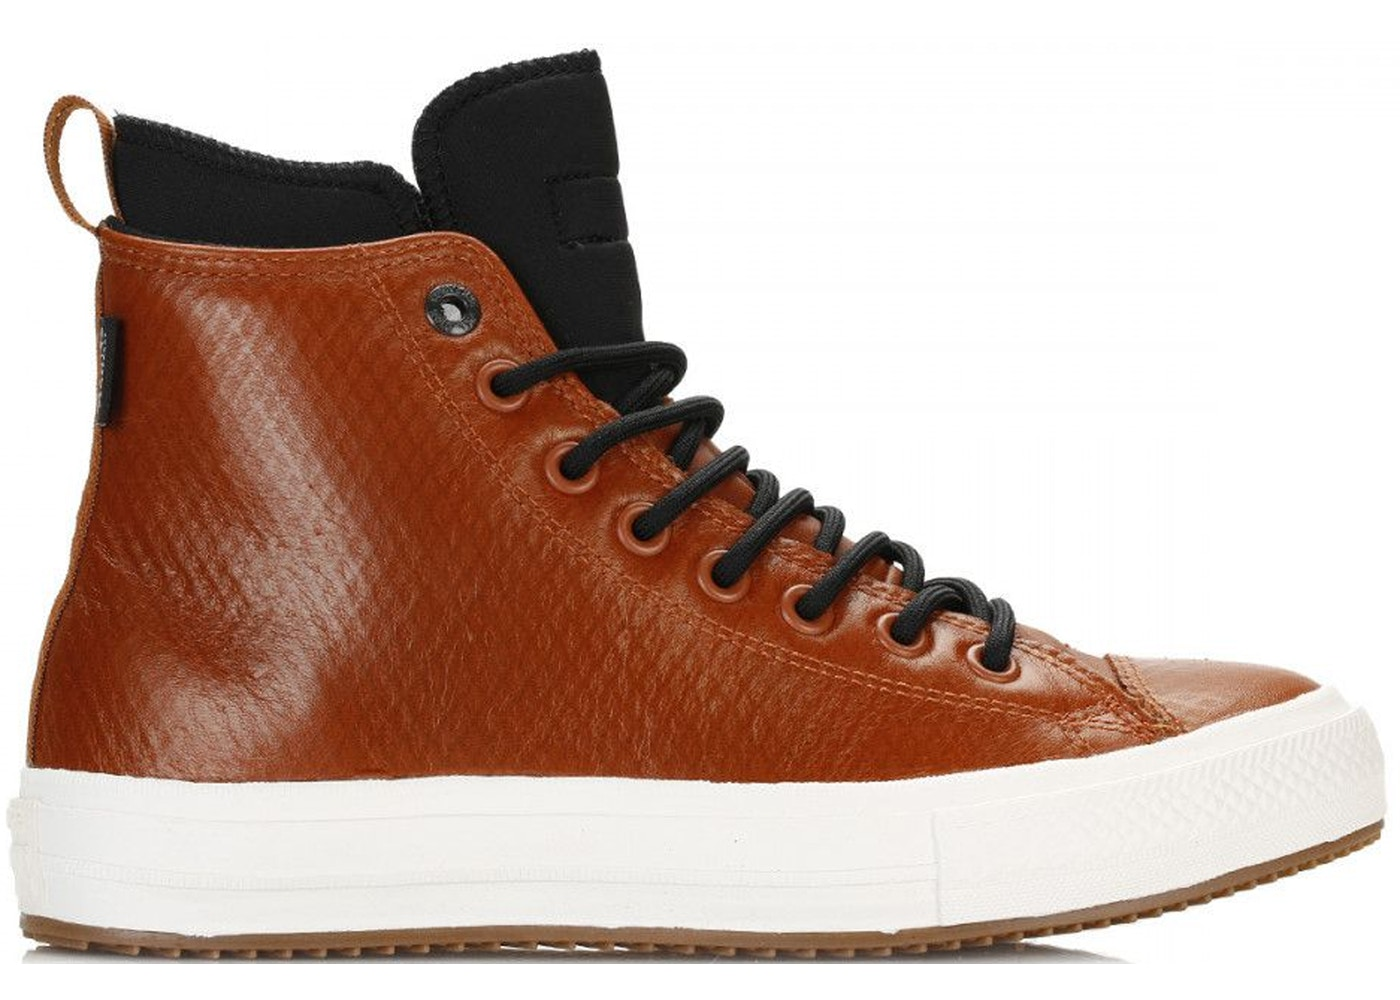 converse chuck taylor 2 boots